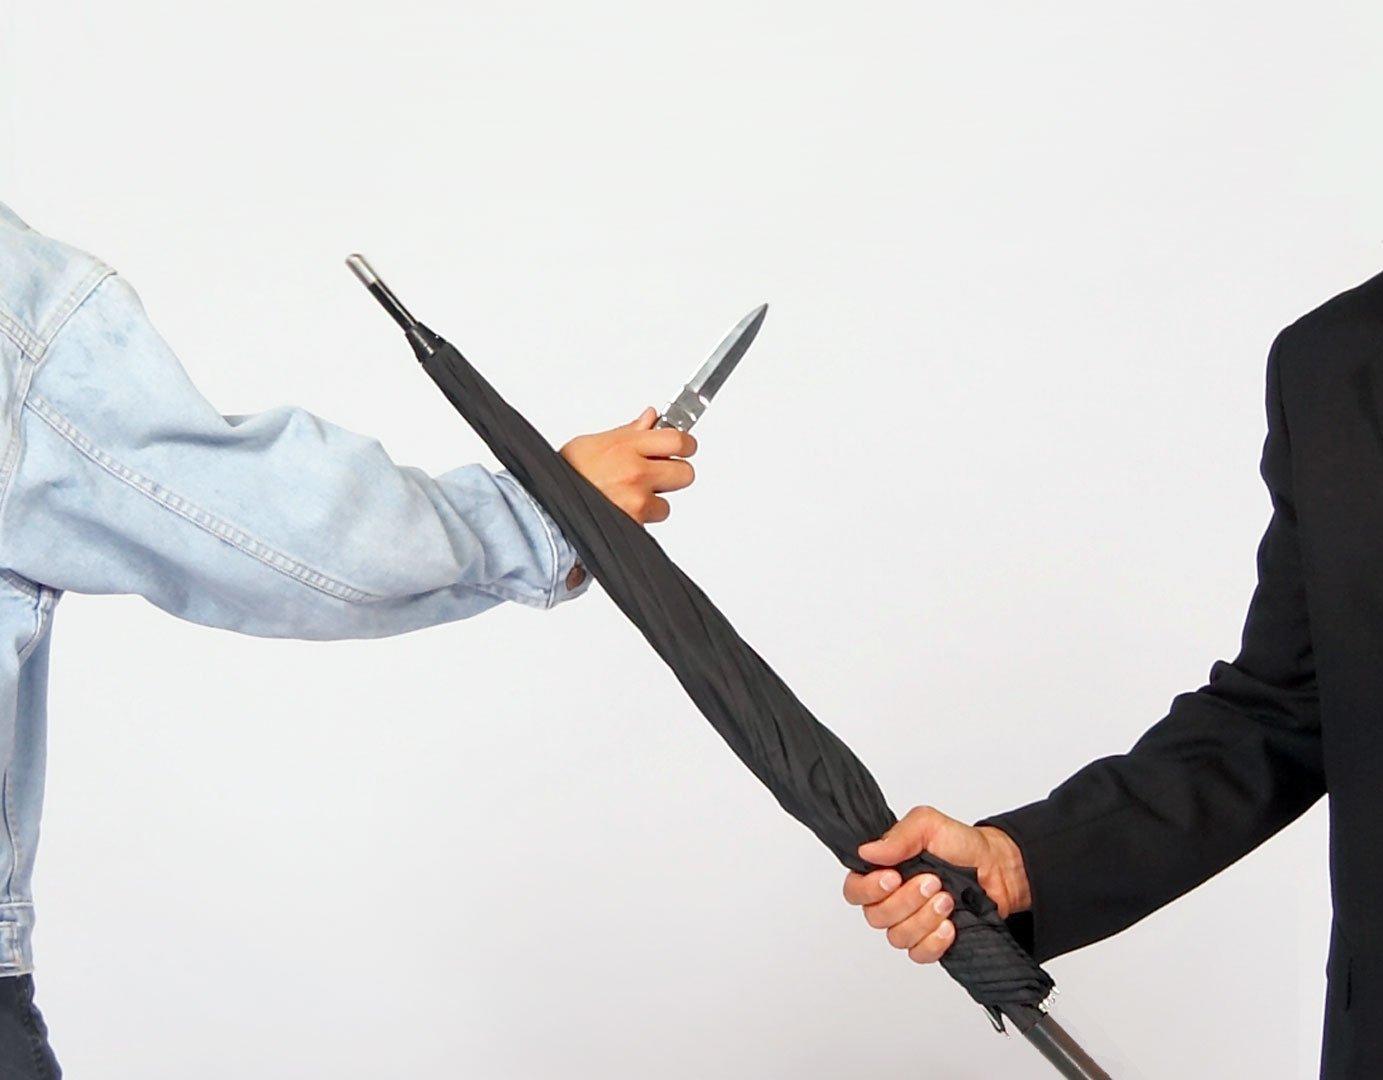 Defense Regenschirm Selbstverteidigung